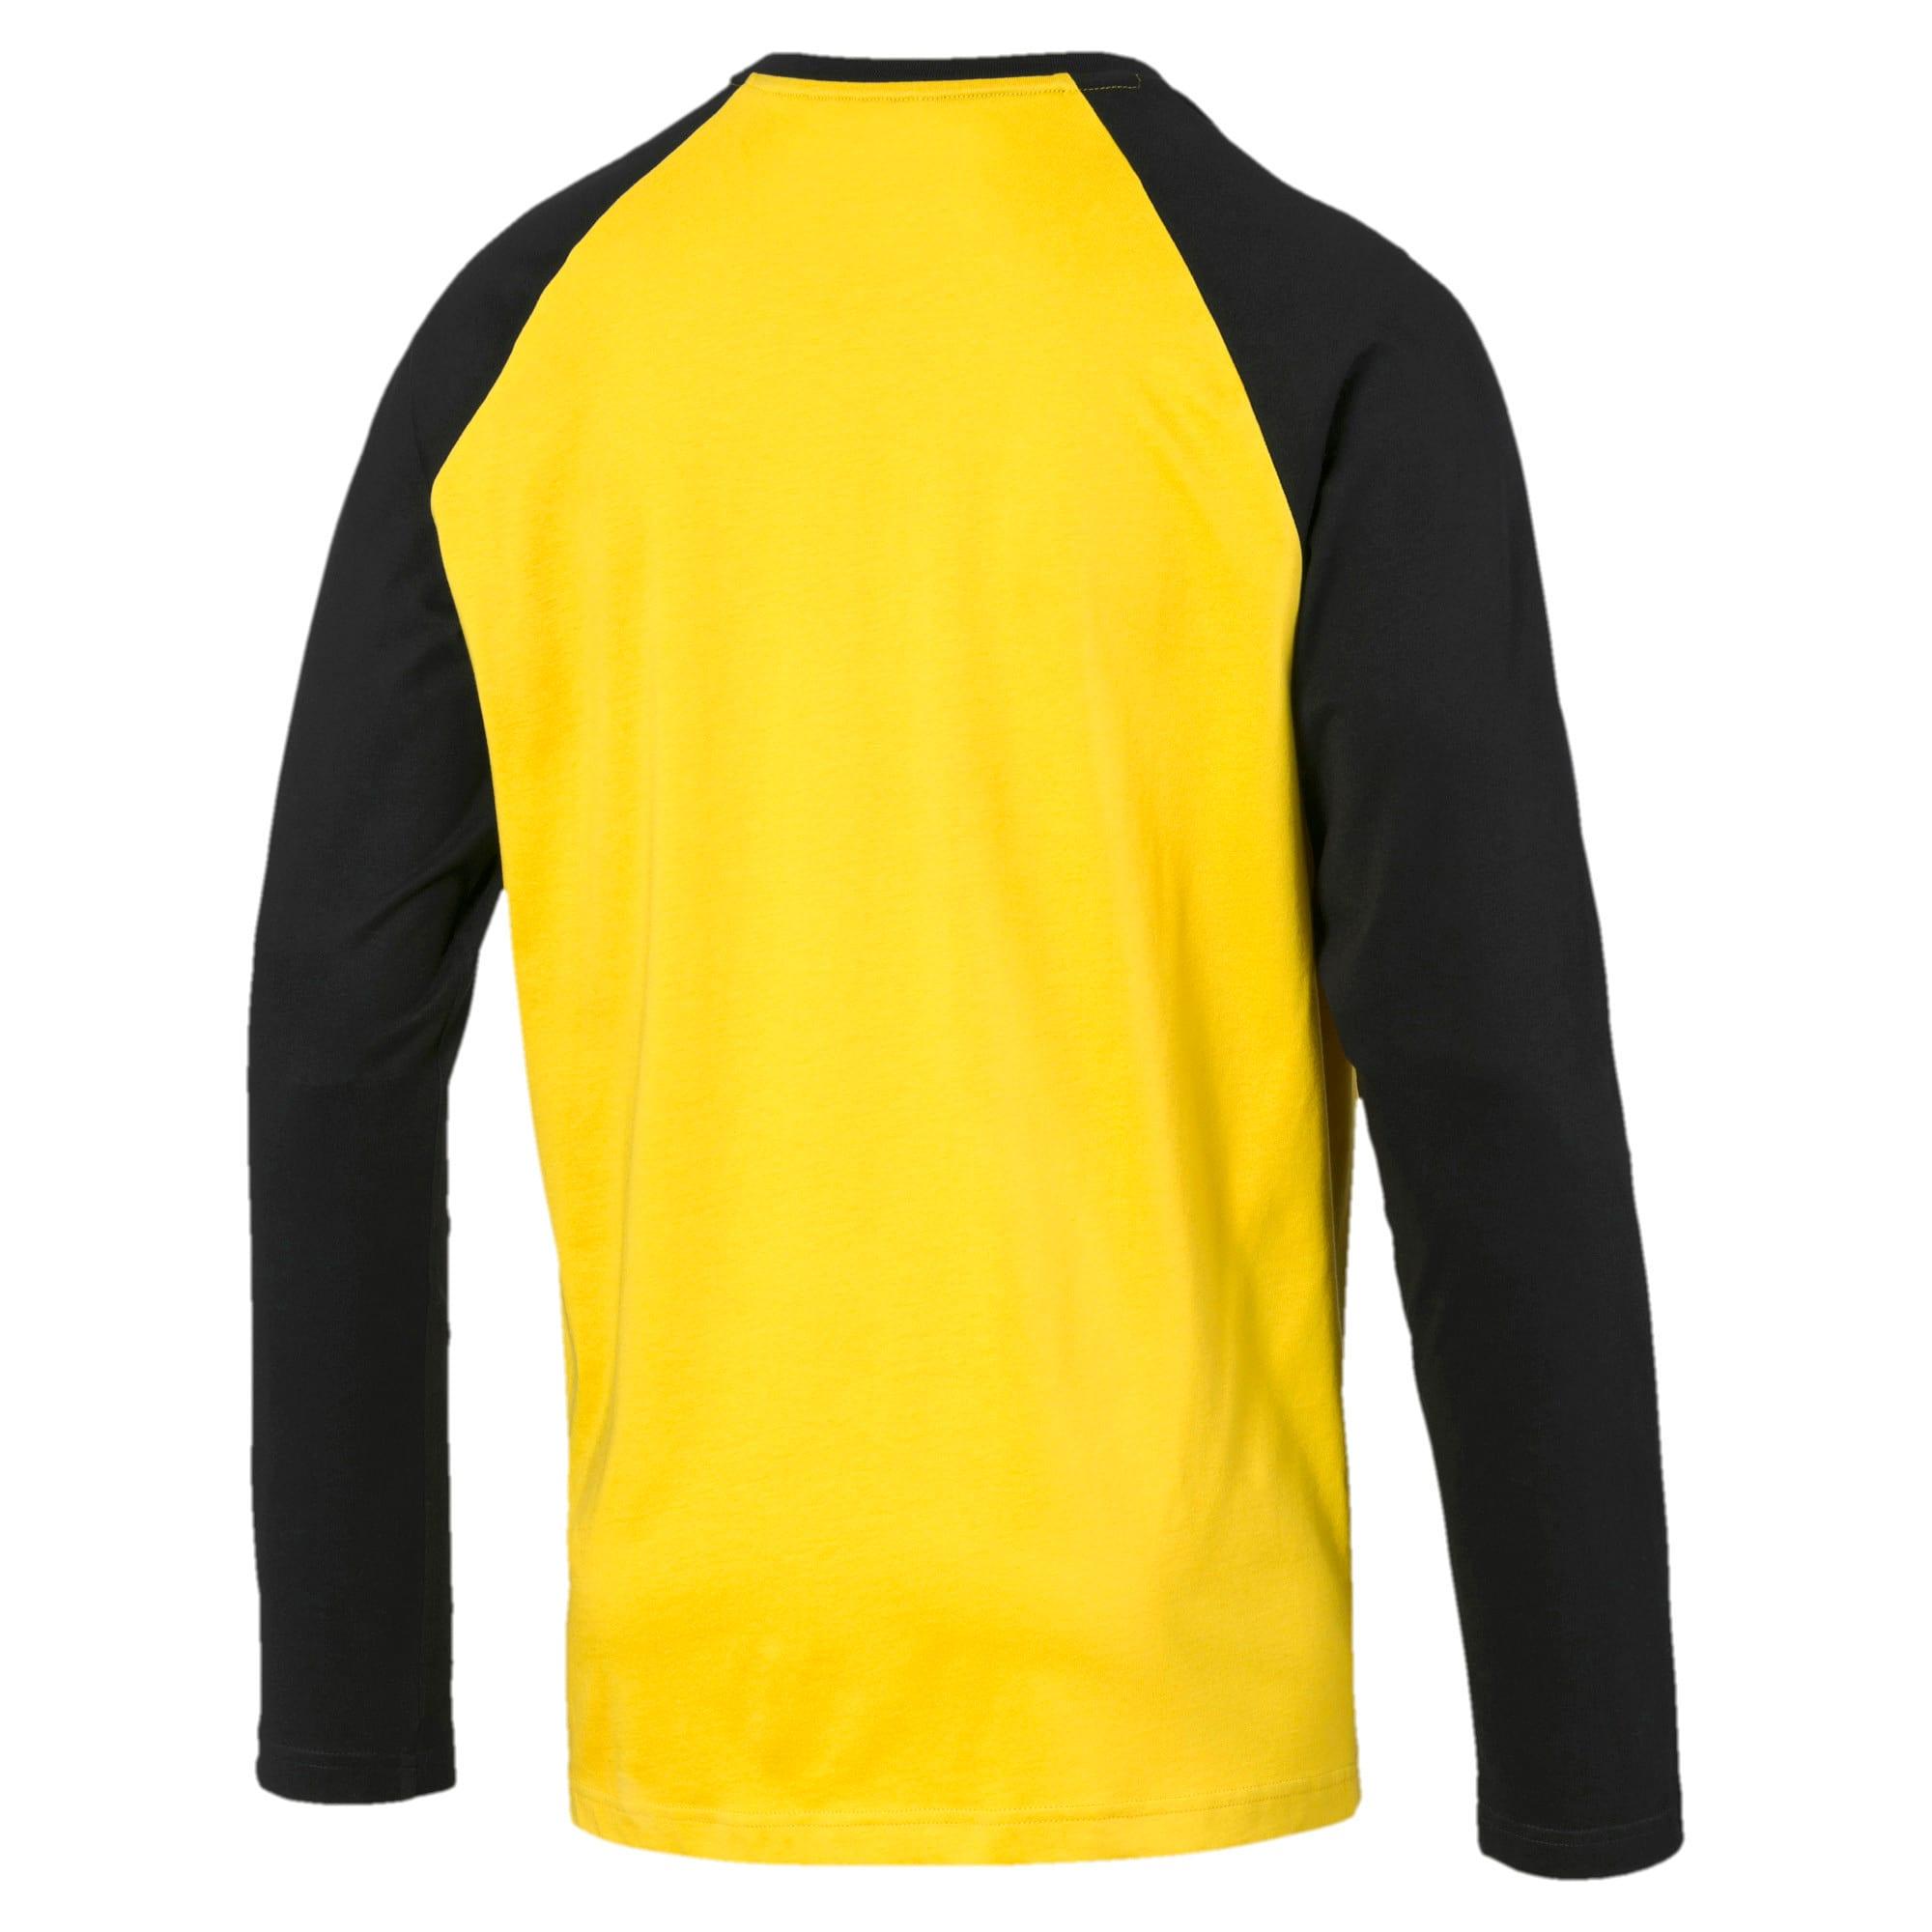 Thumbnail 5 of Modern Sports Long Sleeve Men's Tee, Sulphur, medium-IND